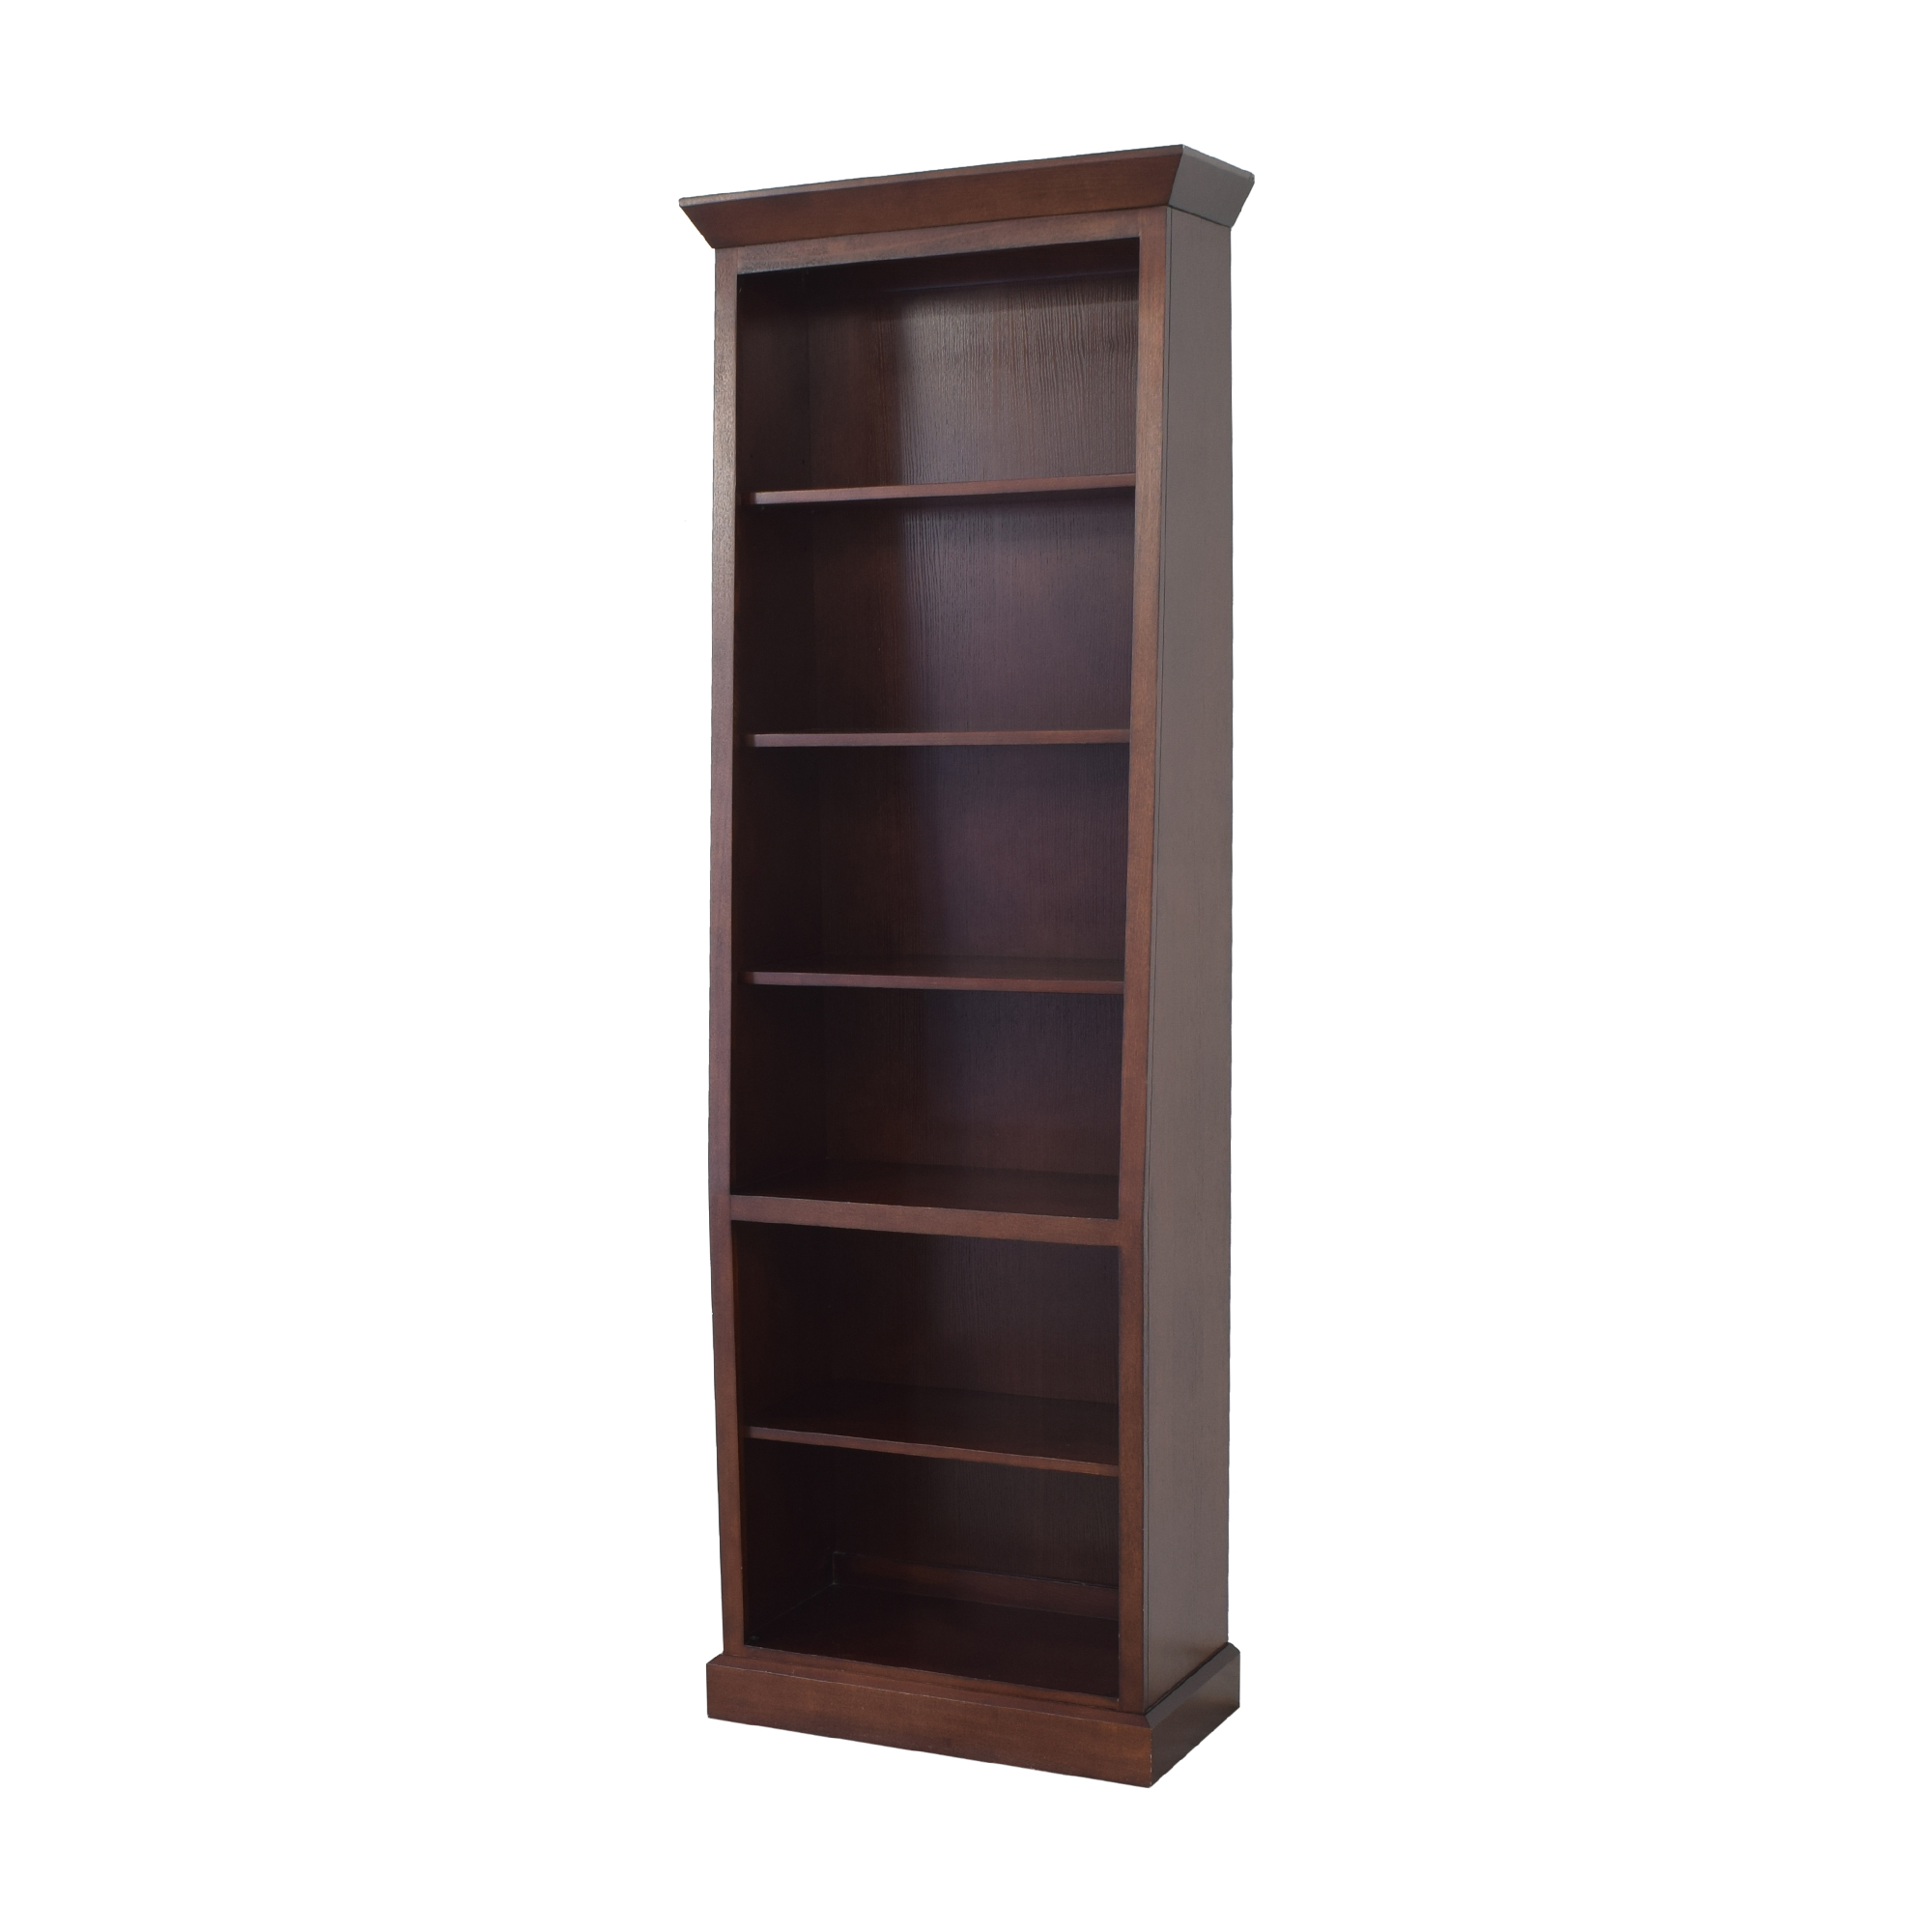 buy Ethan Allen Tall Bookcase Ethan Allen Bookcases & Shelving